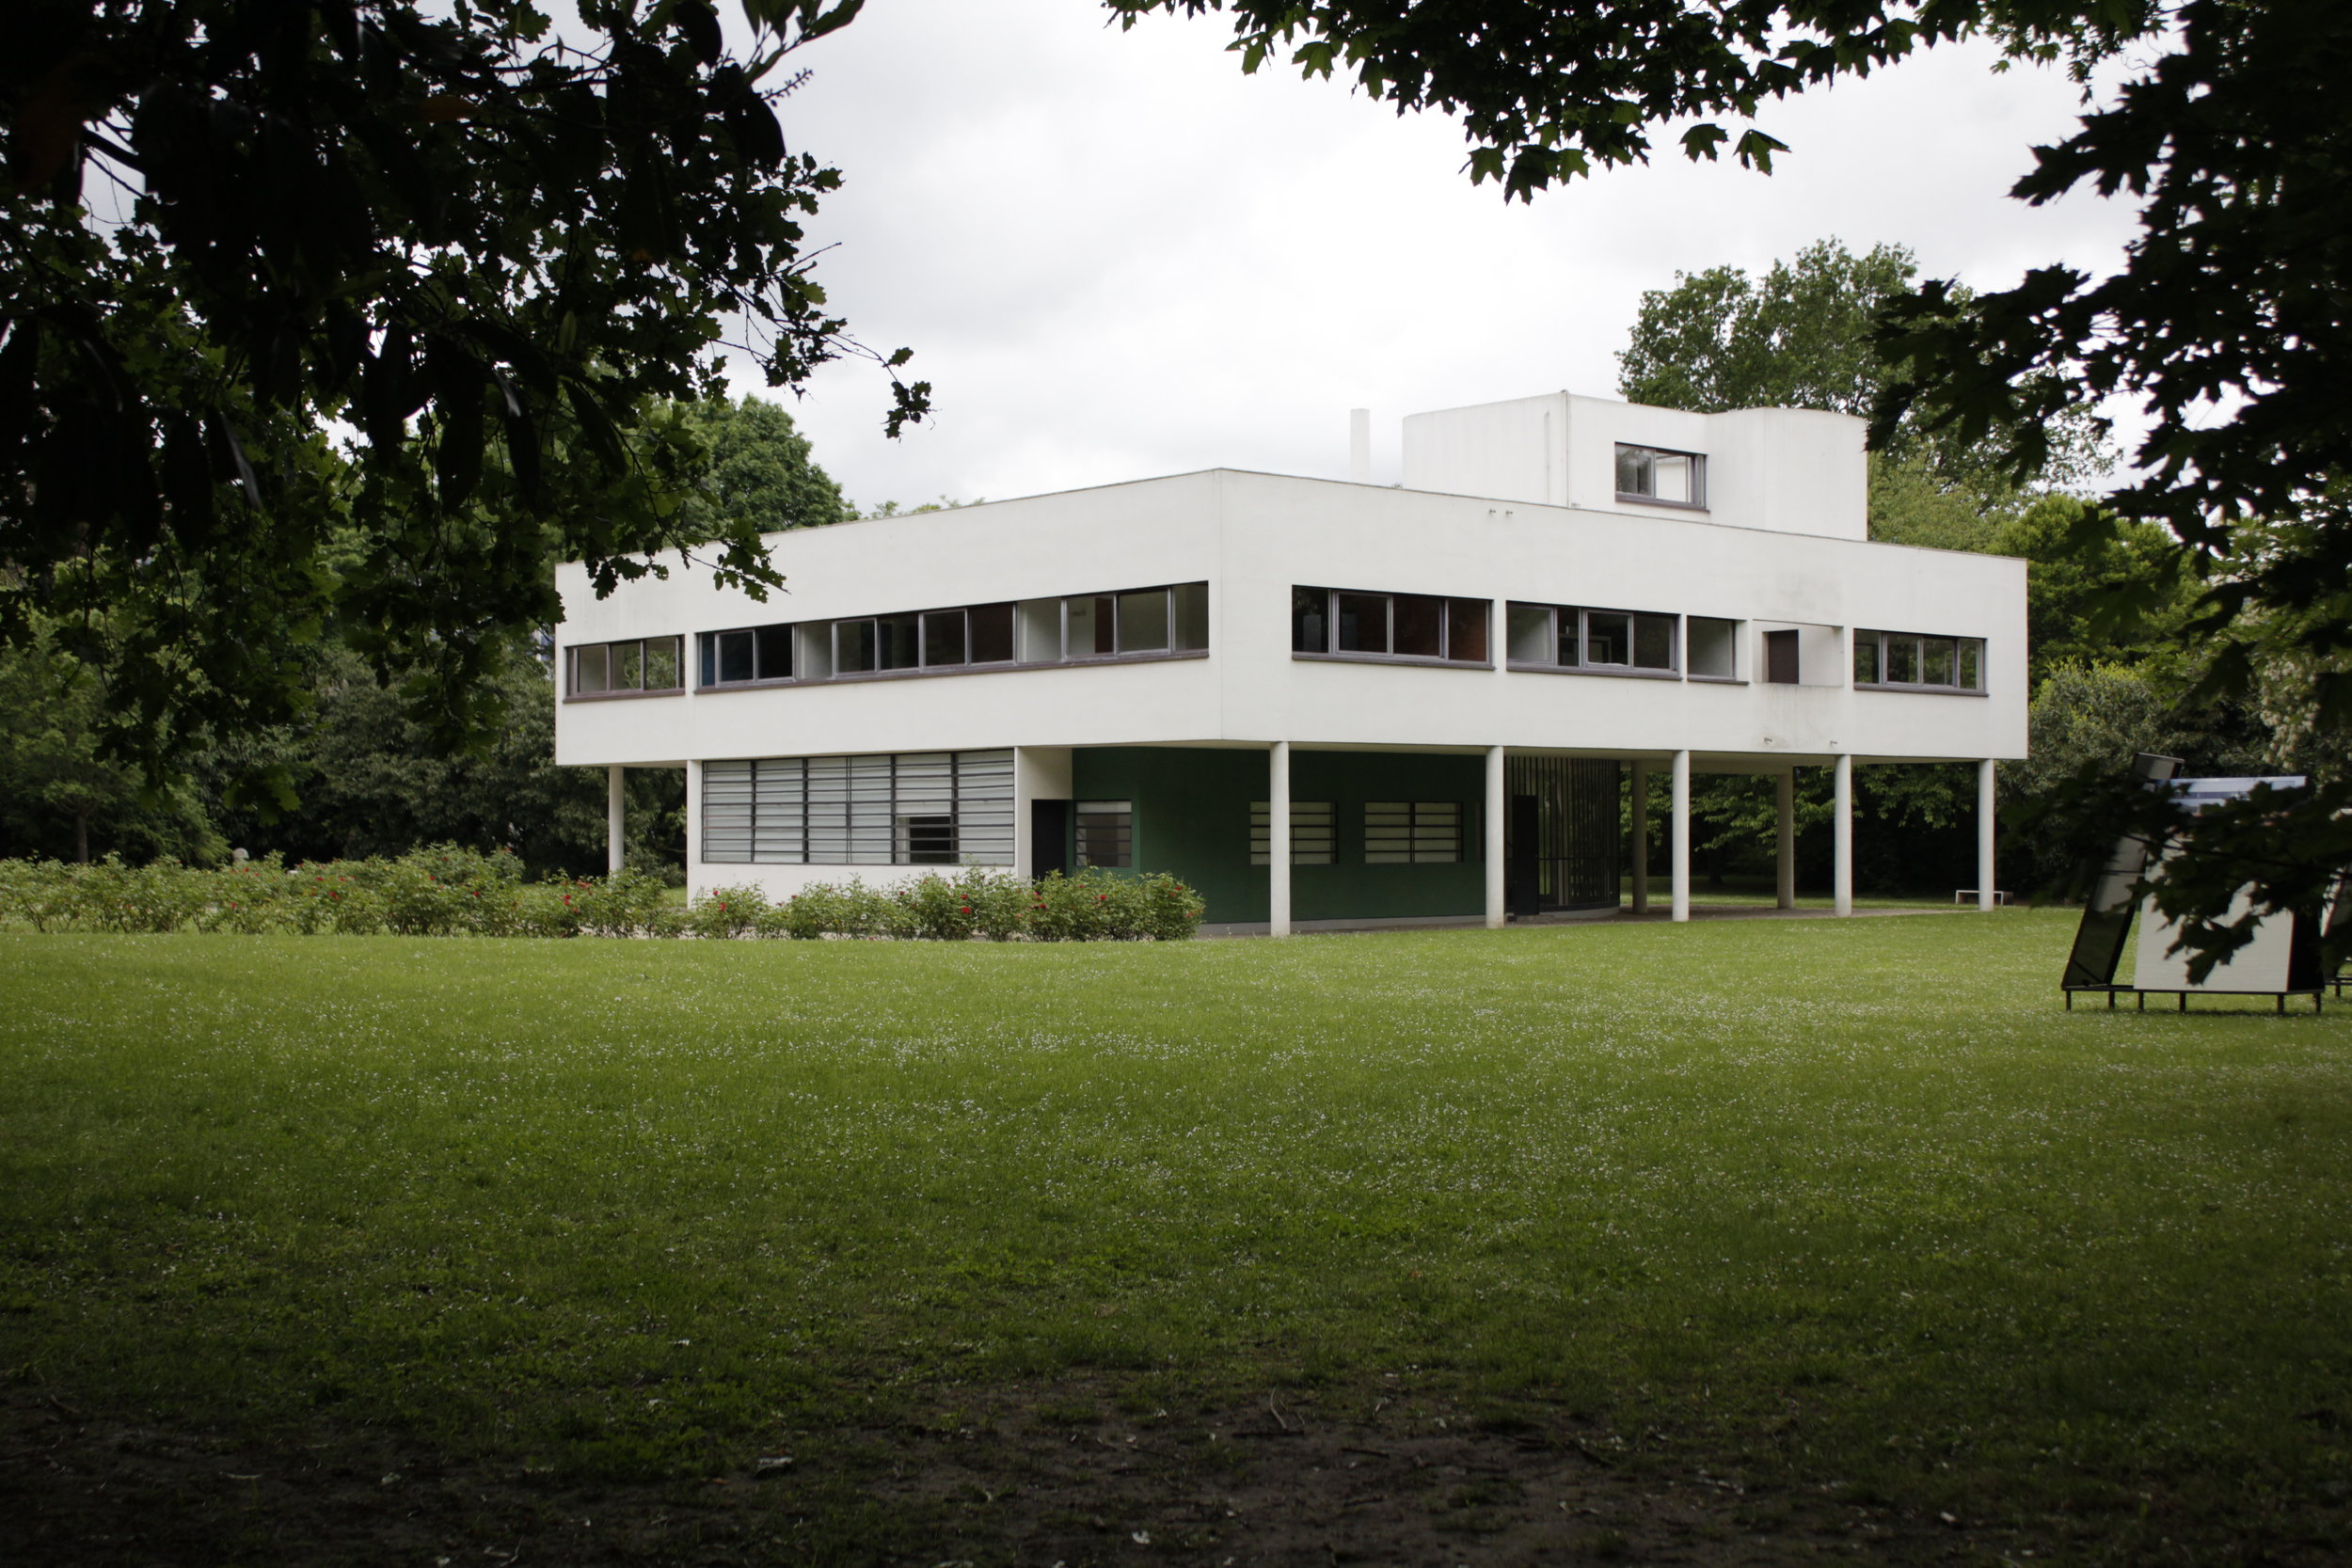 Villa Savoye, Photo by Tom Jenson